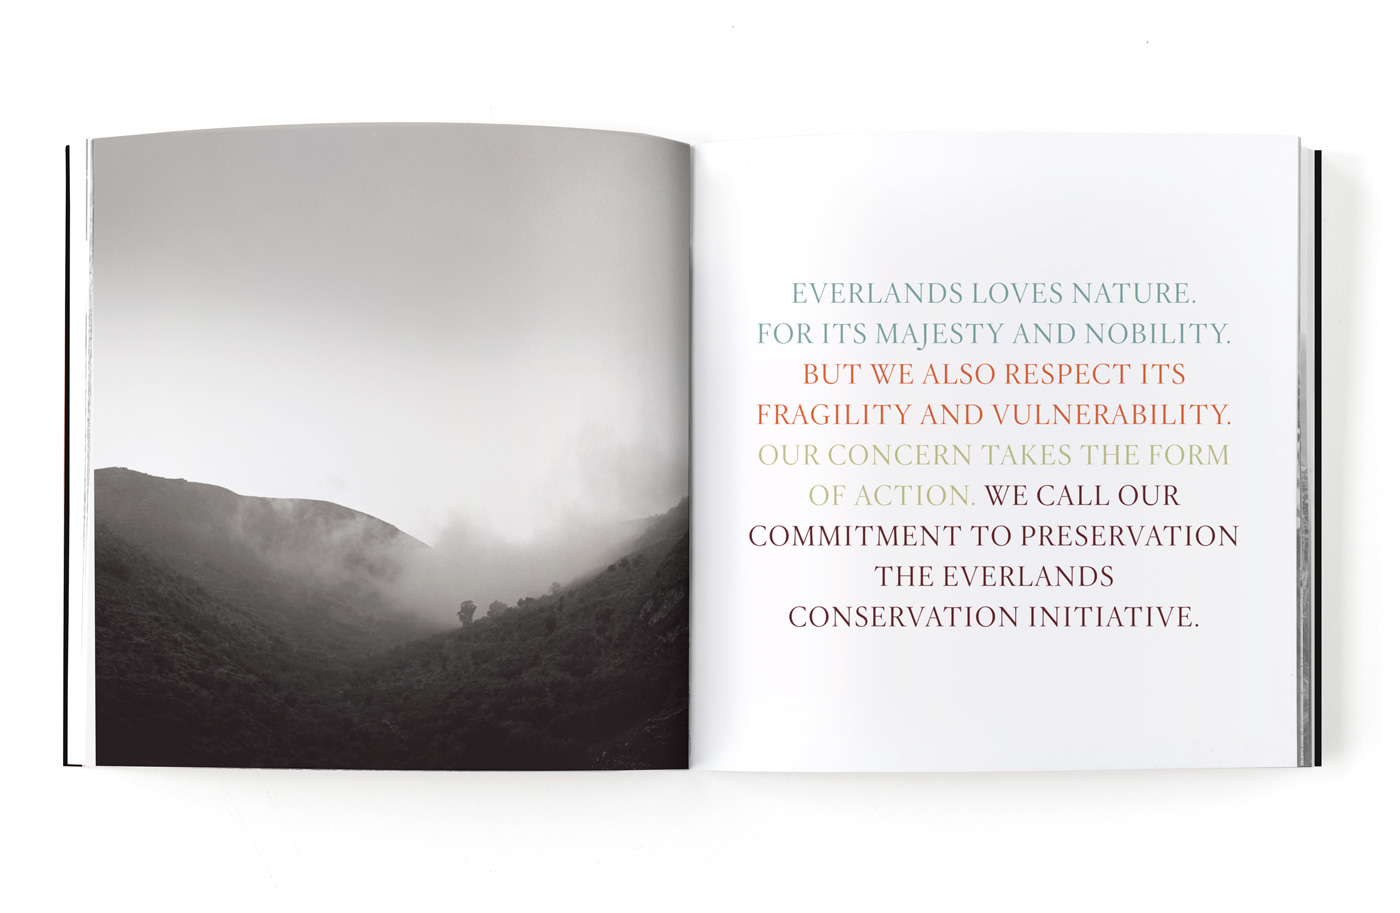 Everlands_24.jpg